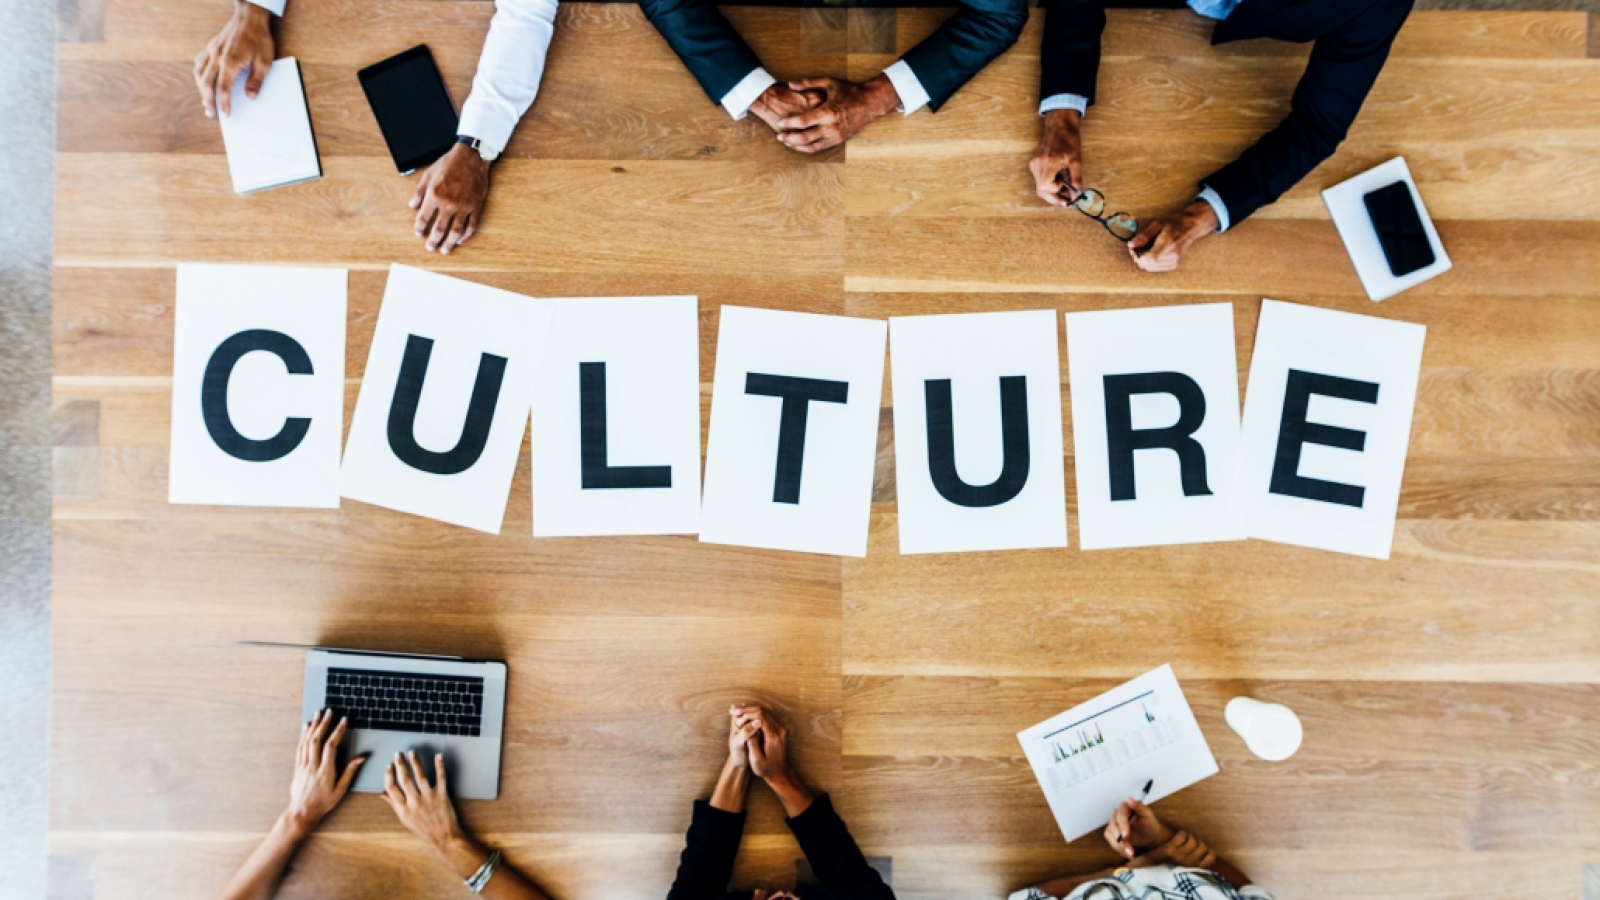 work culture, corporate culture, workplace culture, workethics